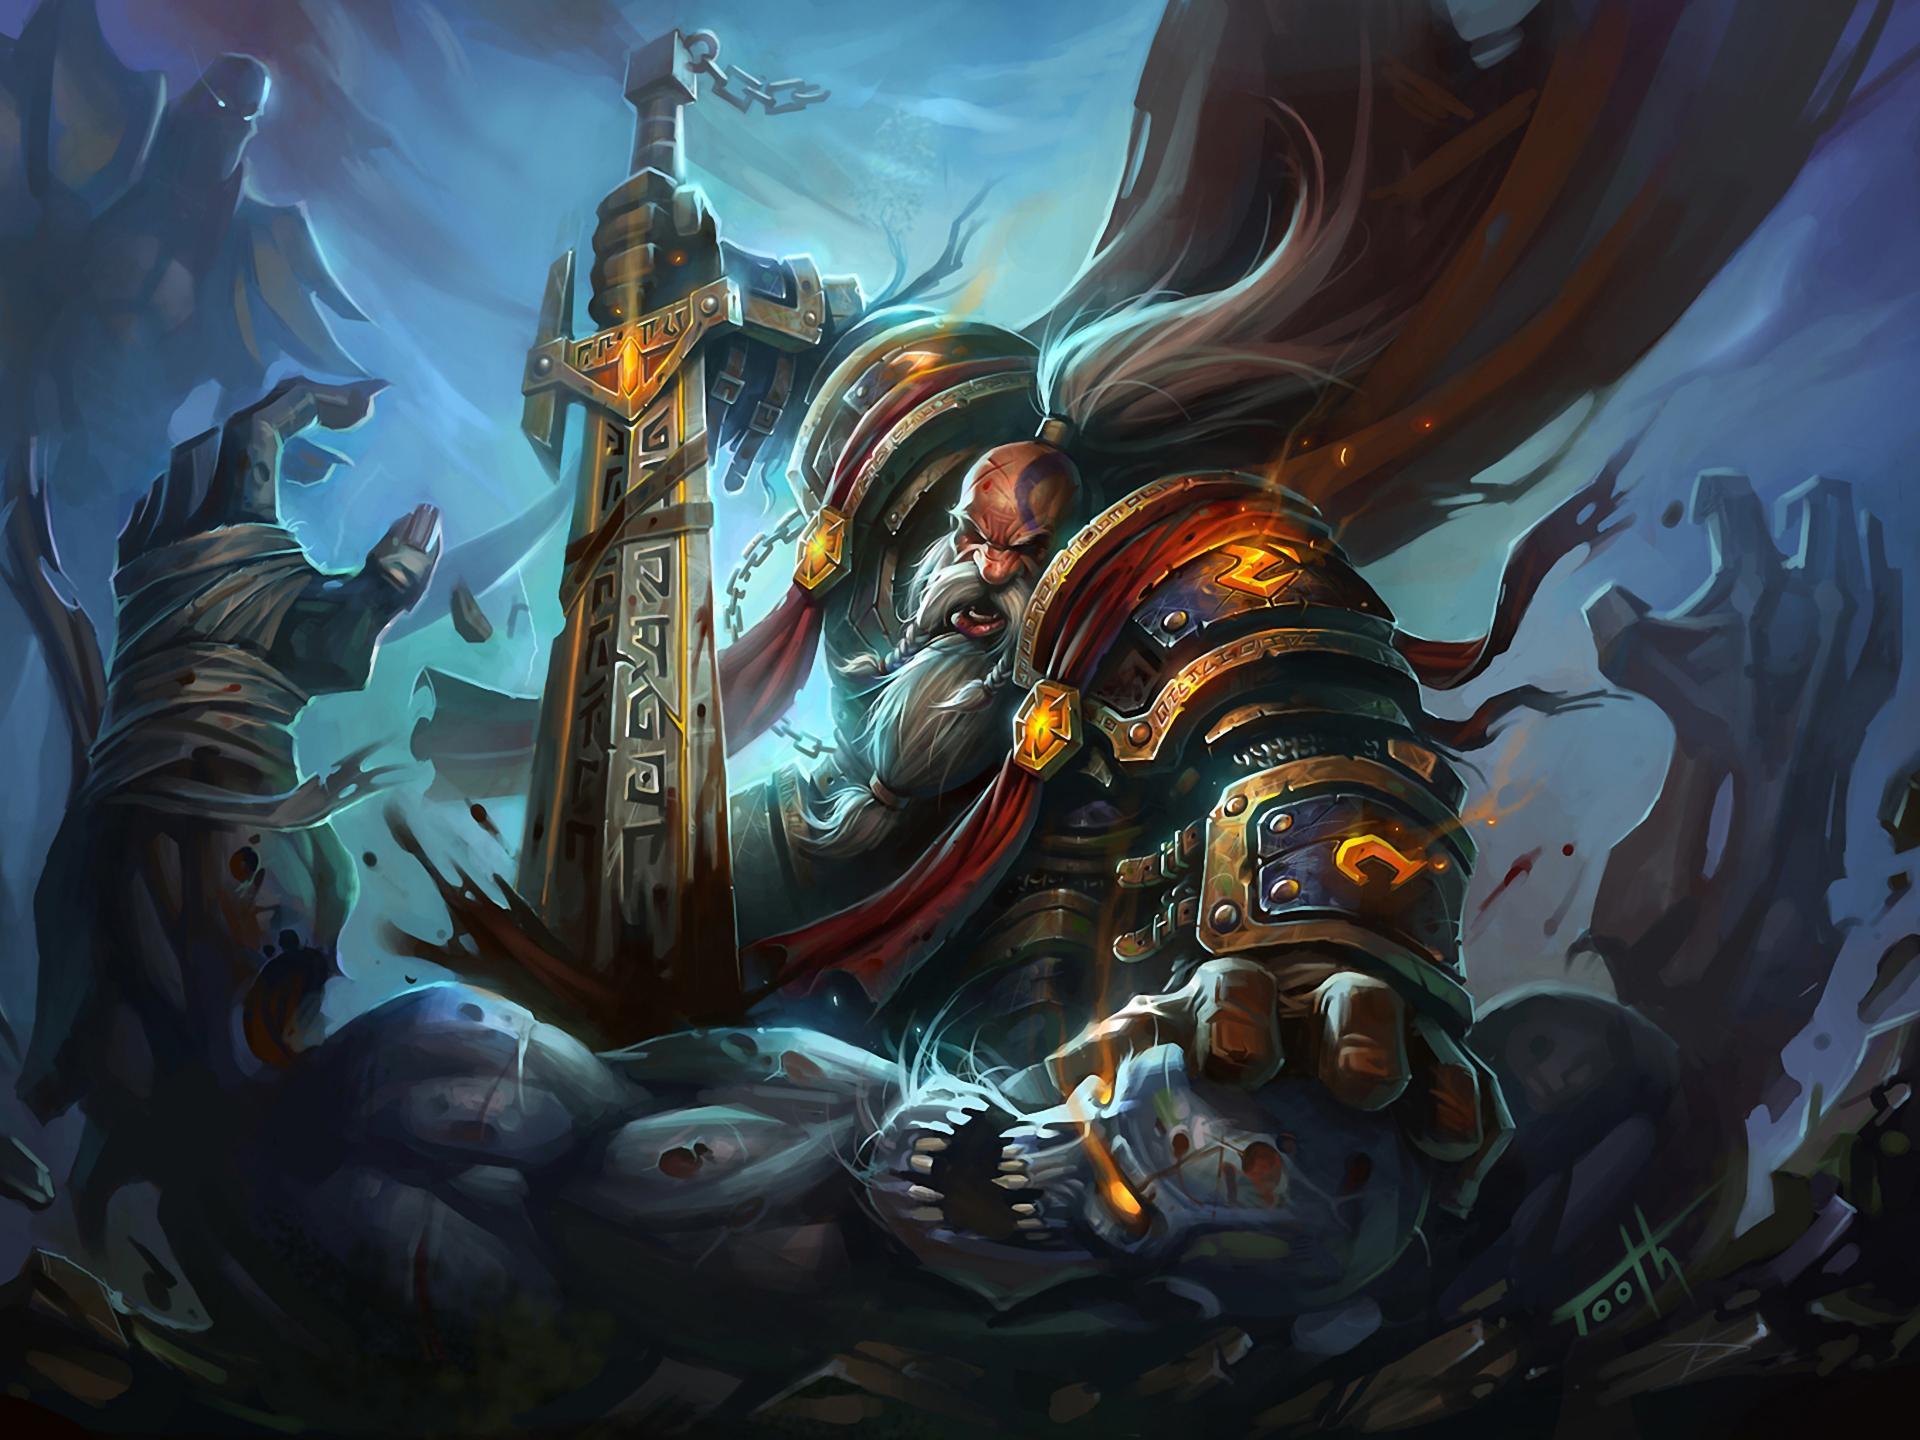 46 World Of Warcraft Paladin Wallpaper On Wallpapersafari